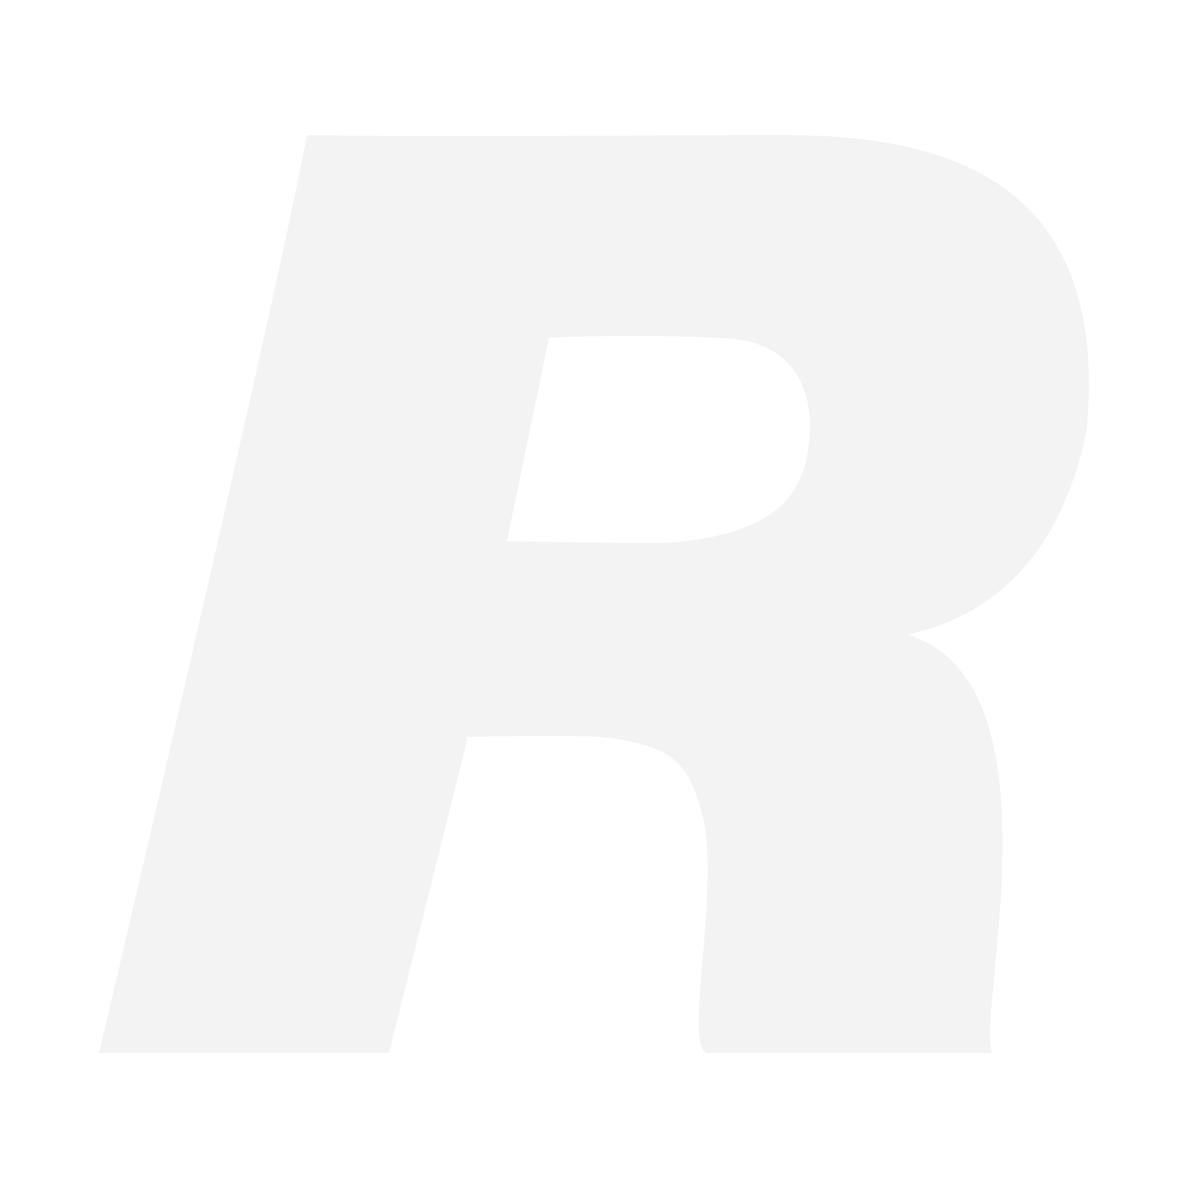 Panasonic VW-CRT1E-K Remot.Pan Tilt Crad